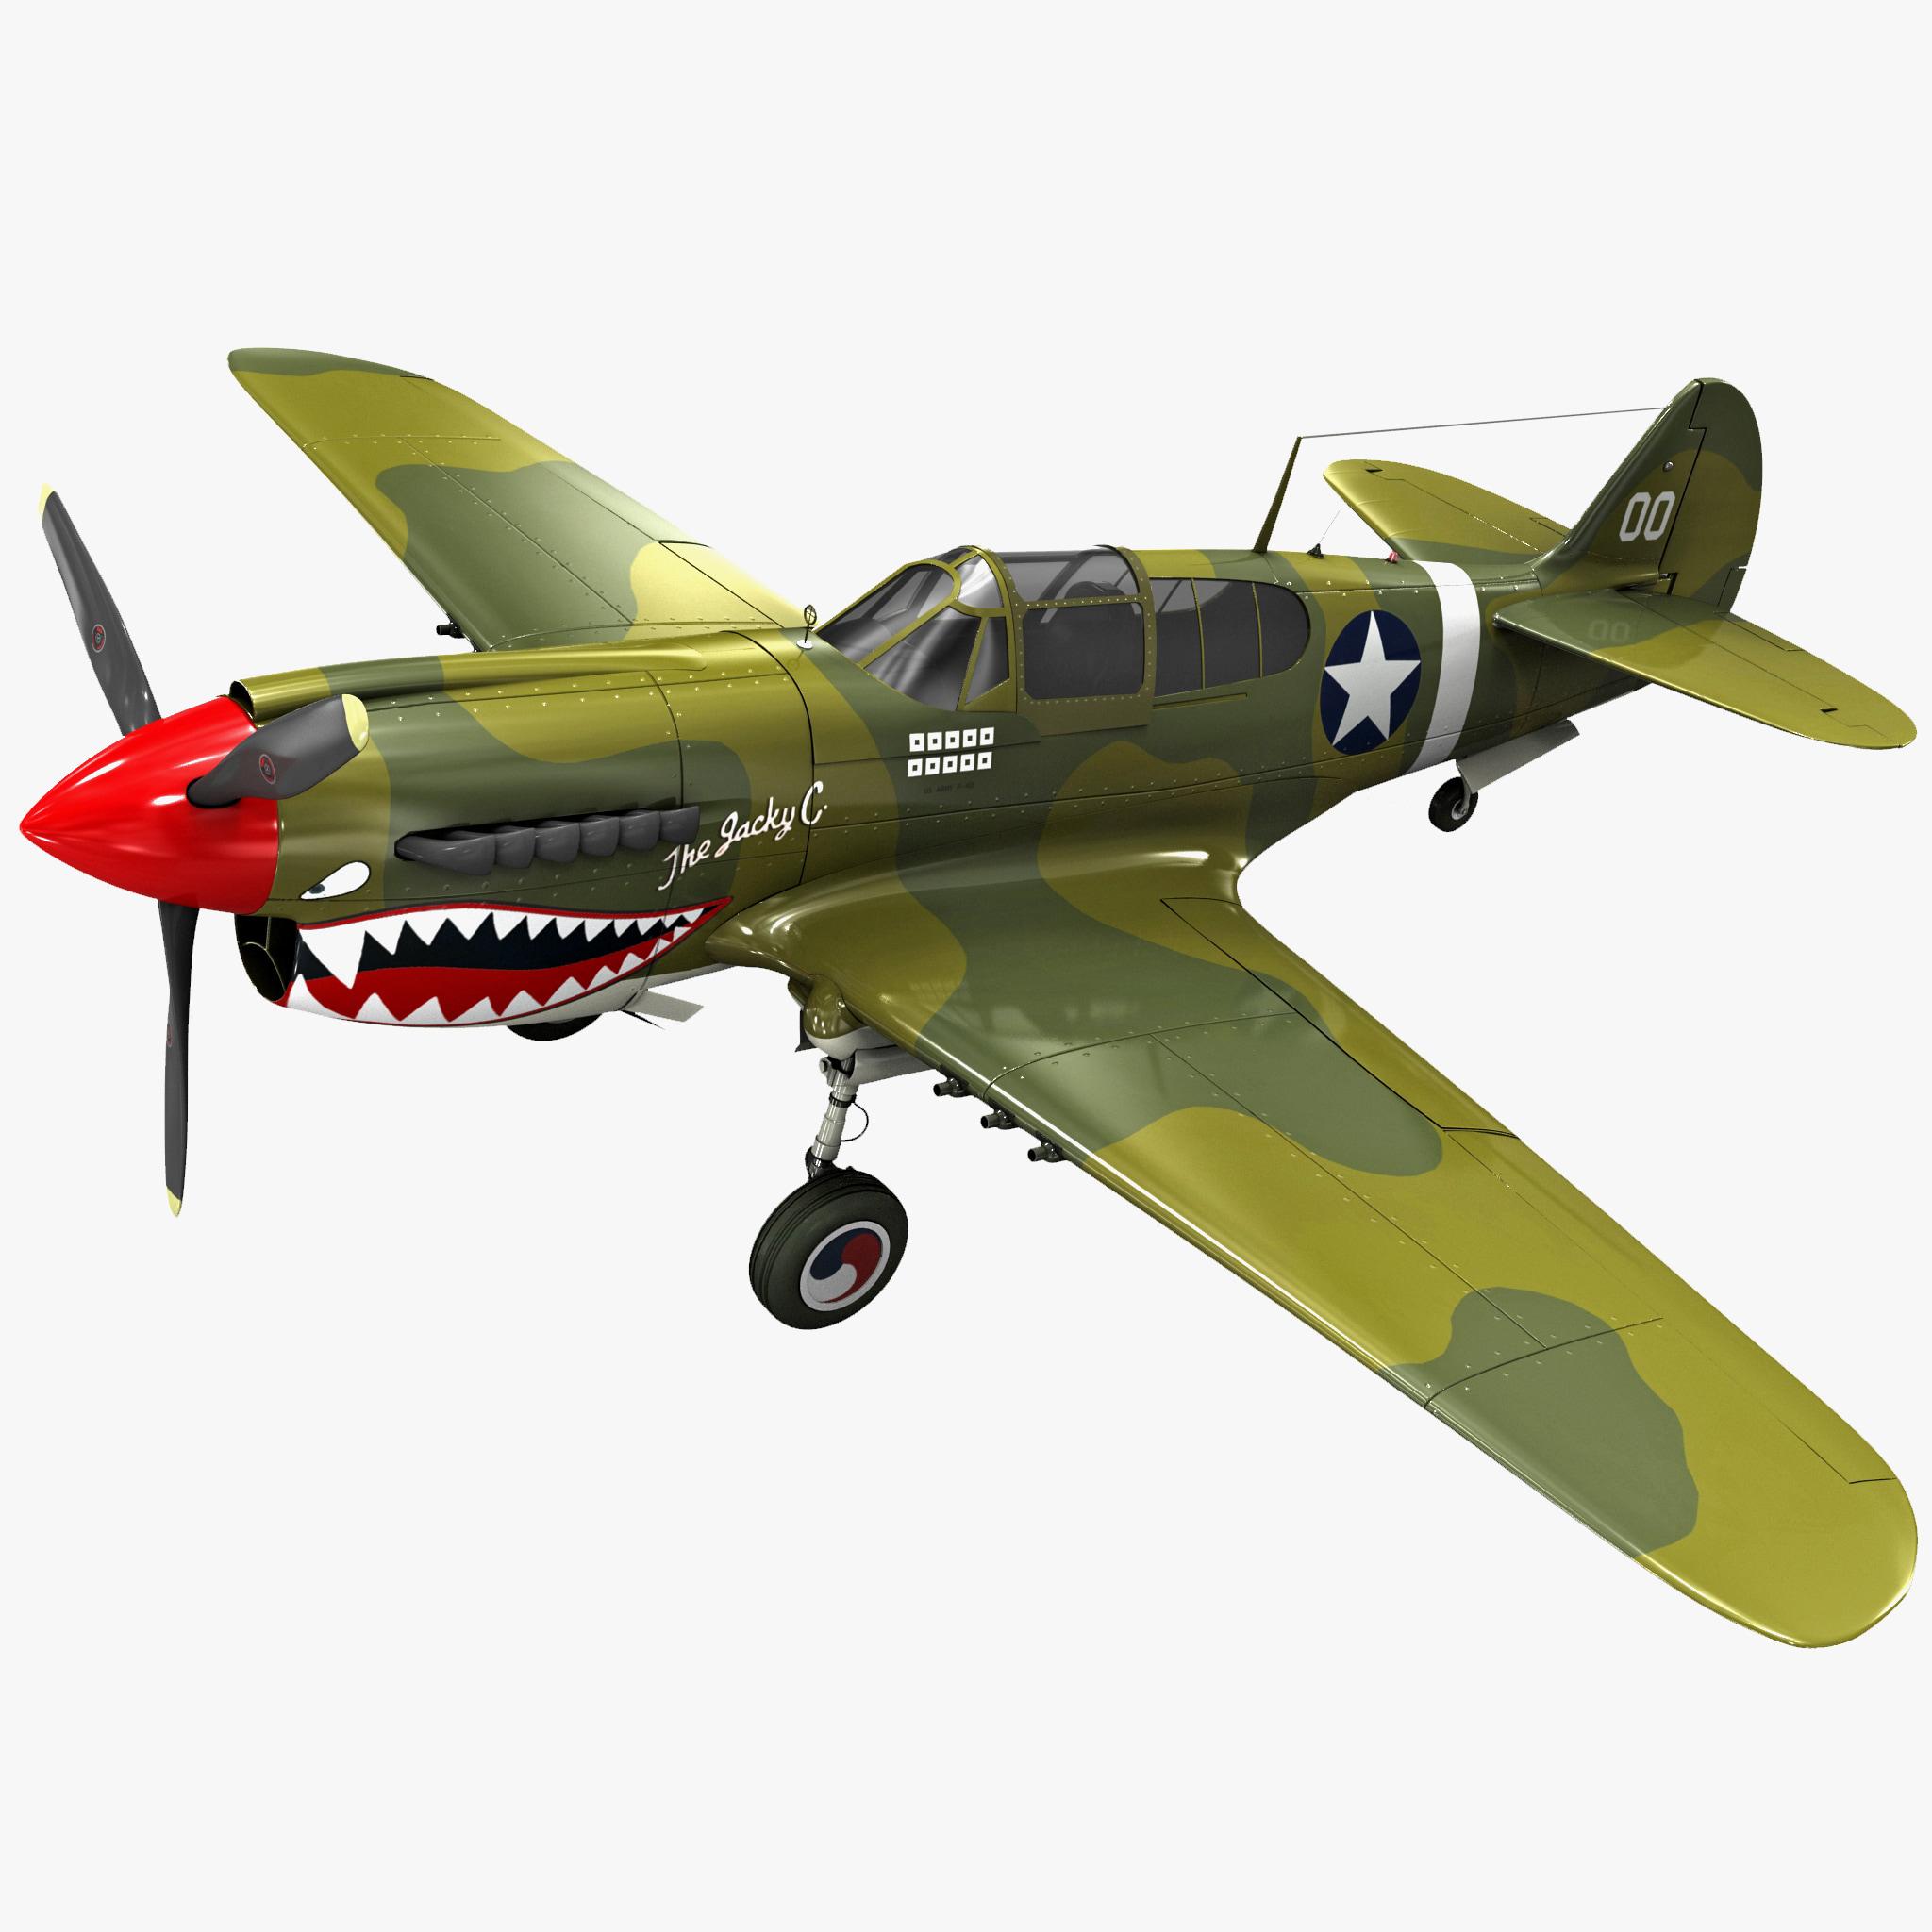 Curtiss P-40 Warhawk US Fighter Rigged